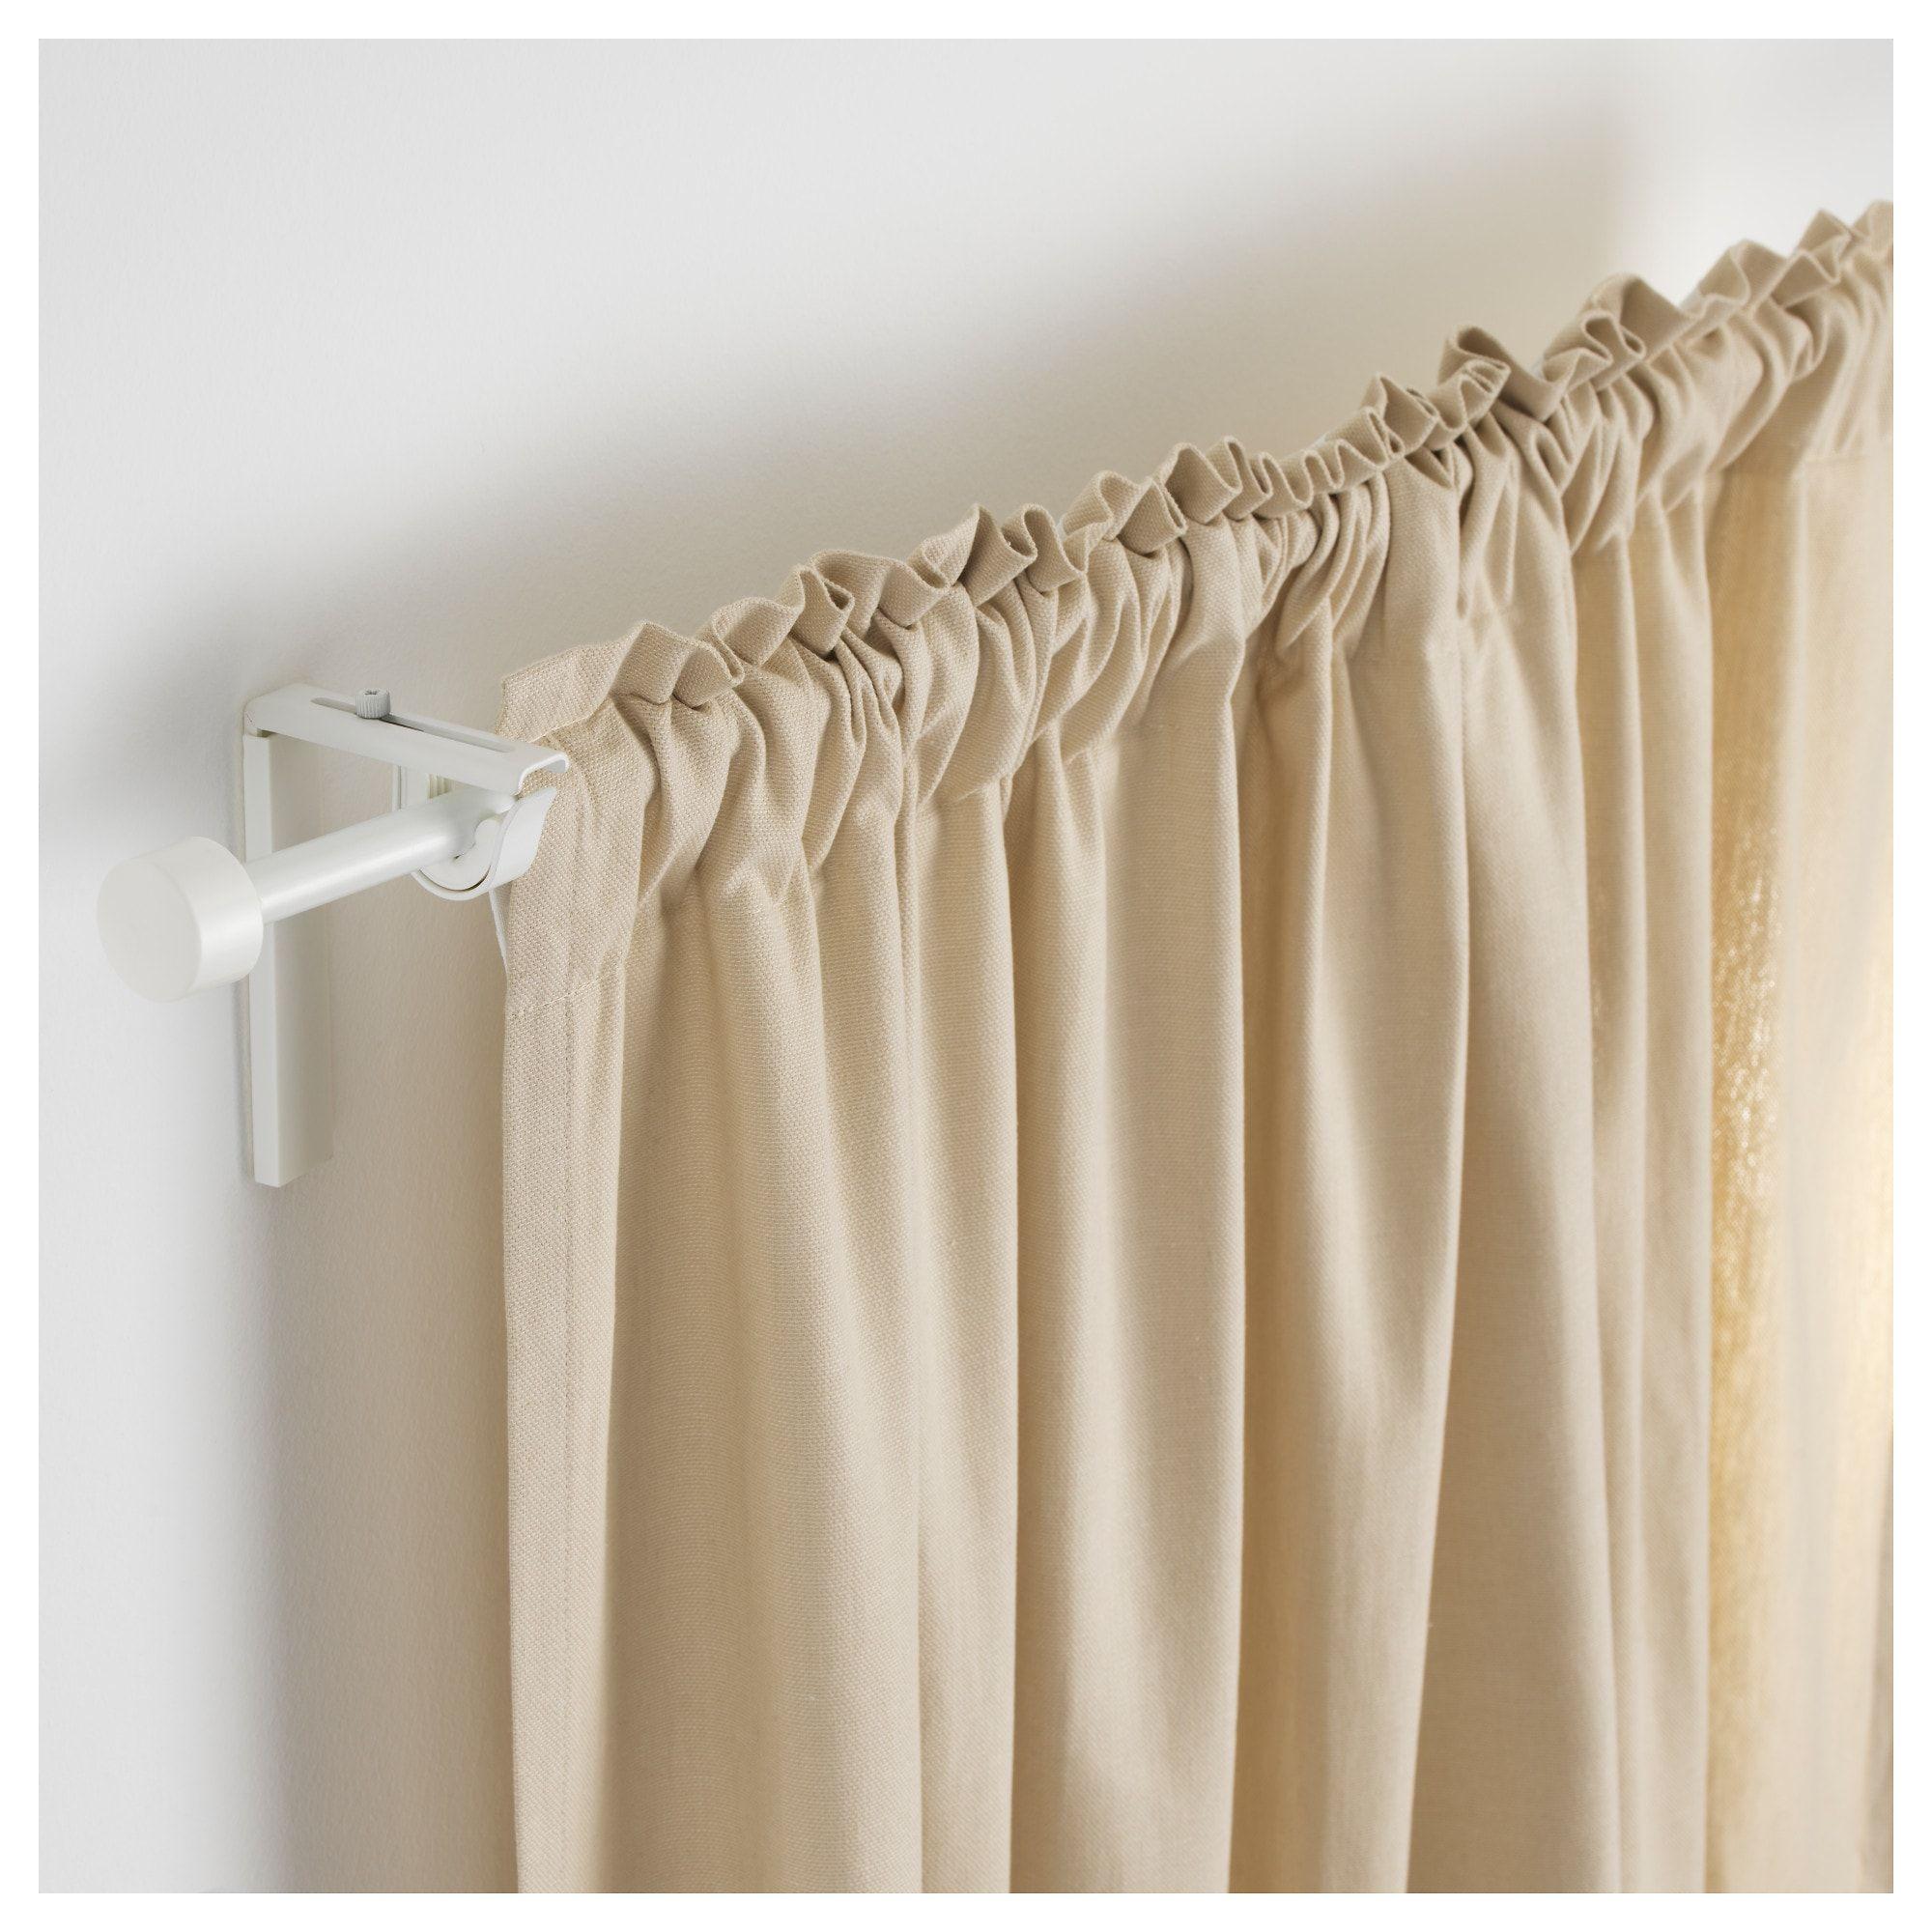 Best IKEA Curtain Poles & Accessories